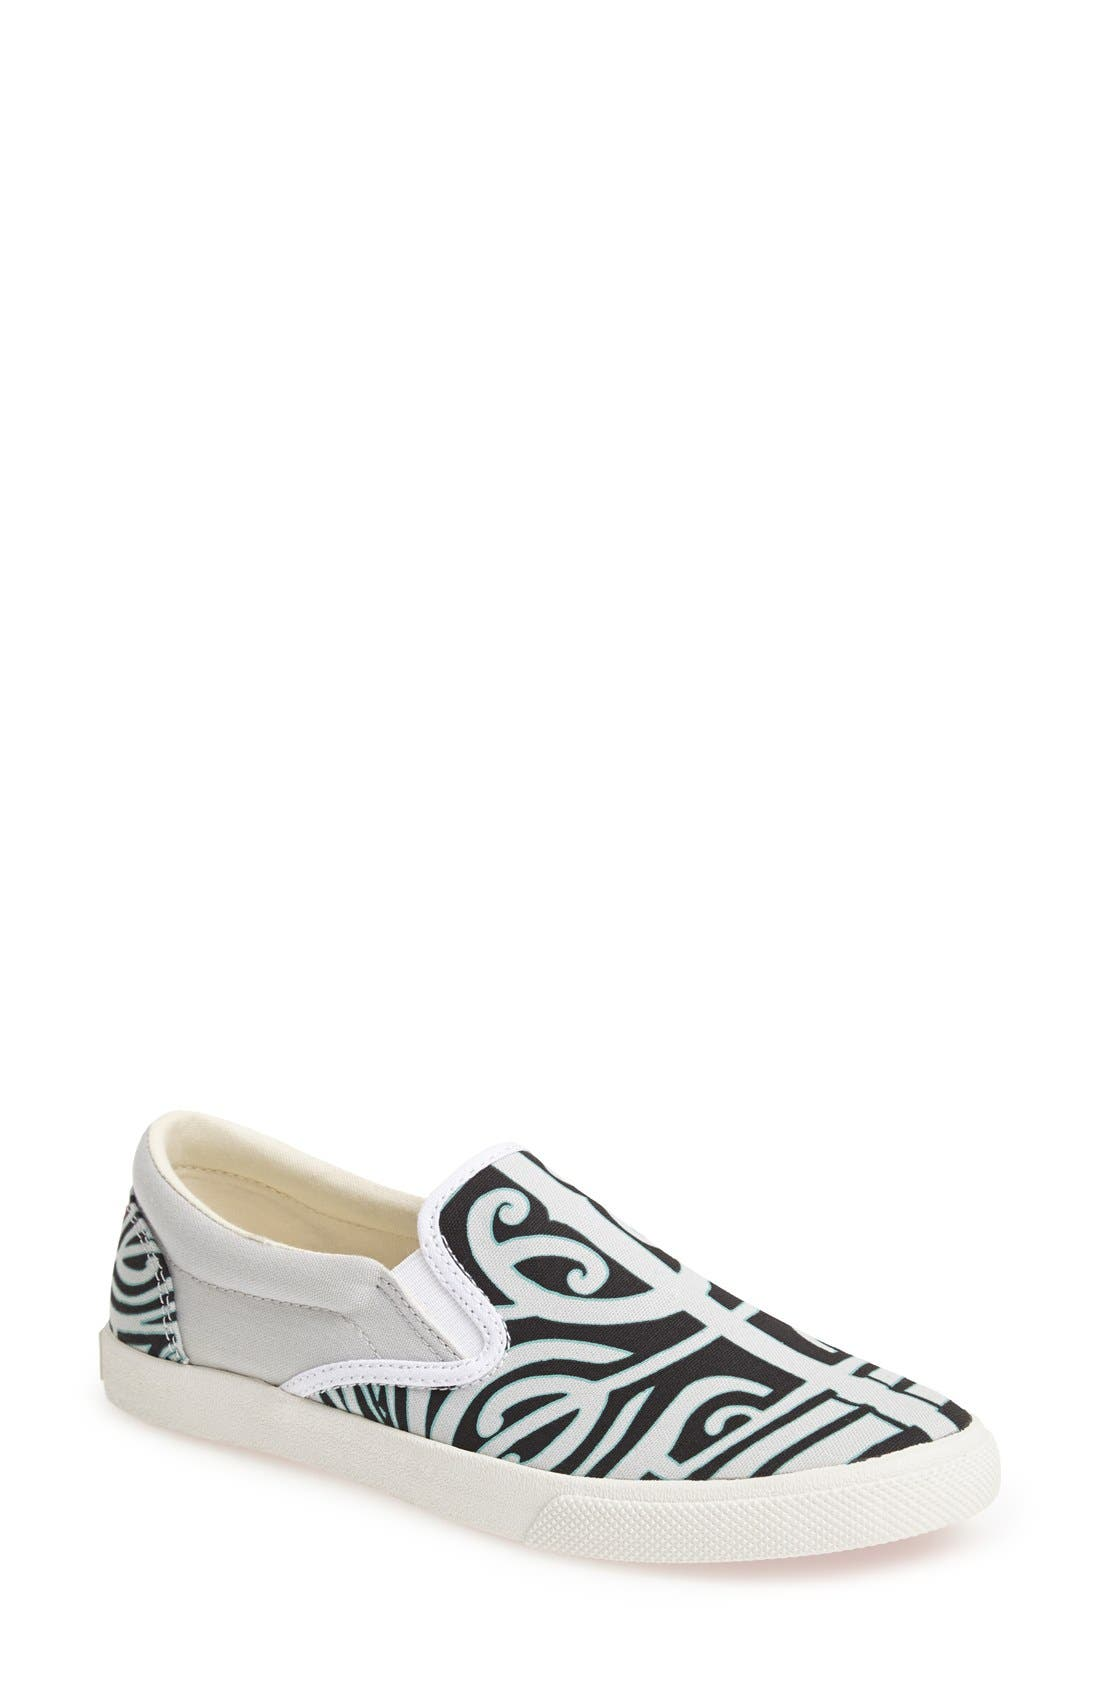 Main Image - BucketFeet 'Tatau' Slip-On Canvas Sneaker (Women)